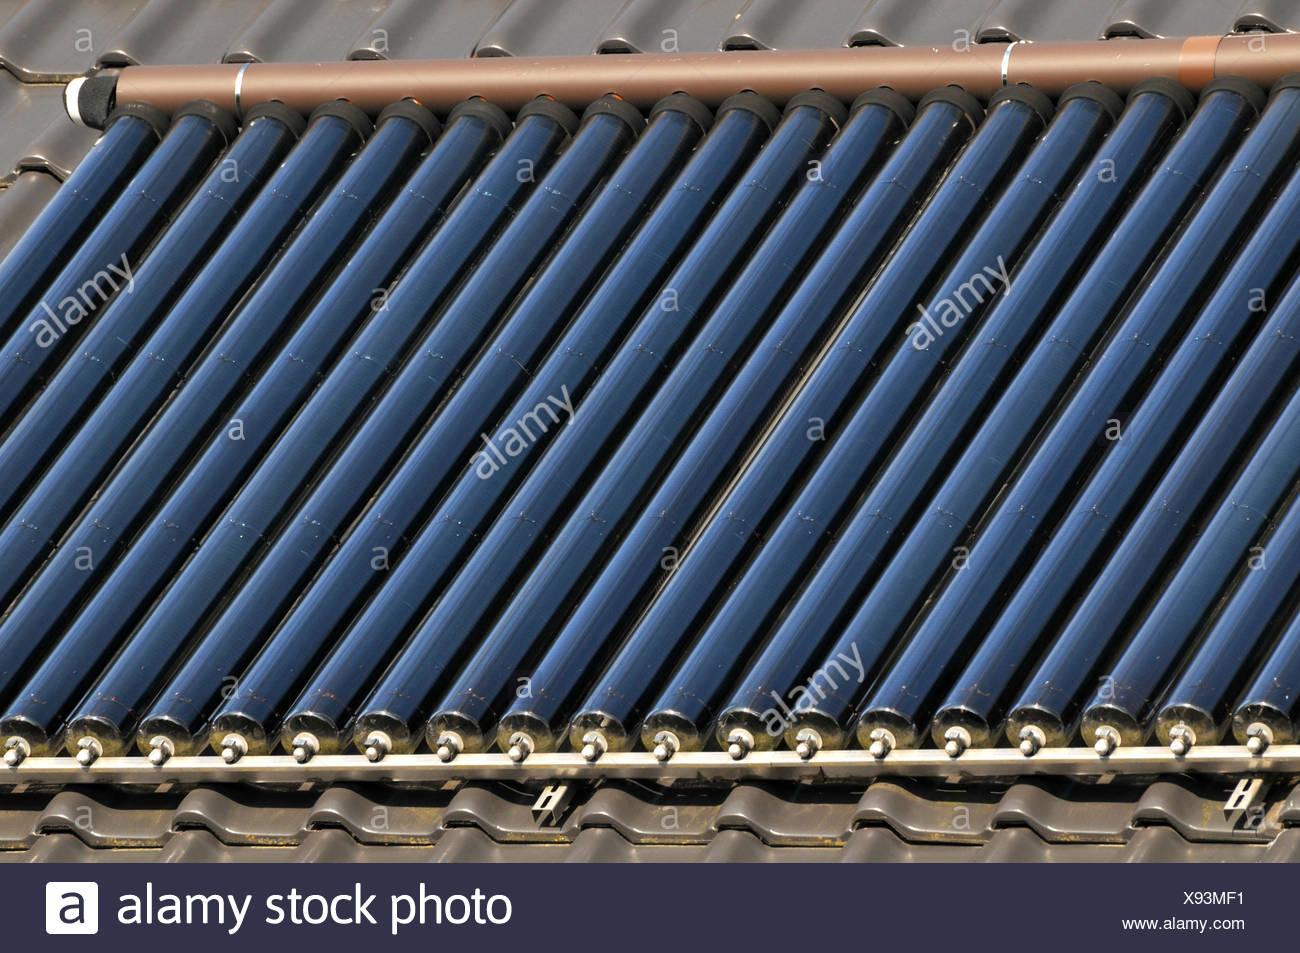 environmentally friendly - Stock Image